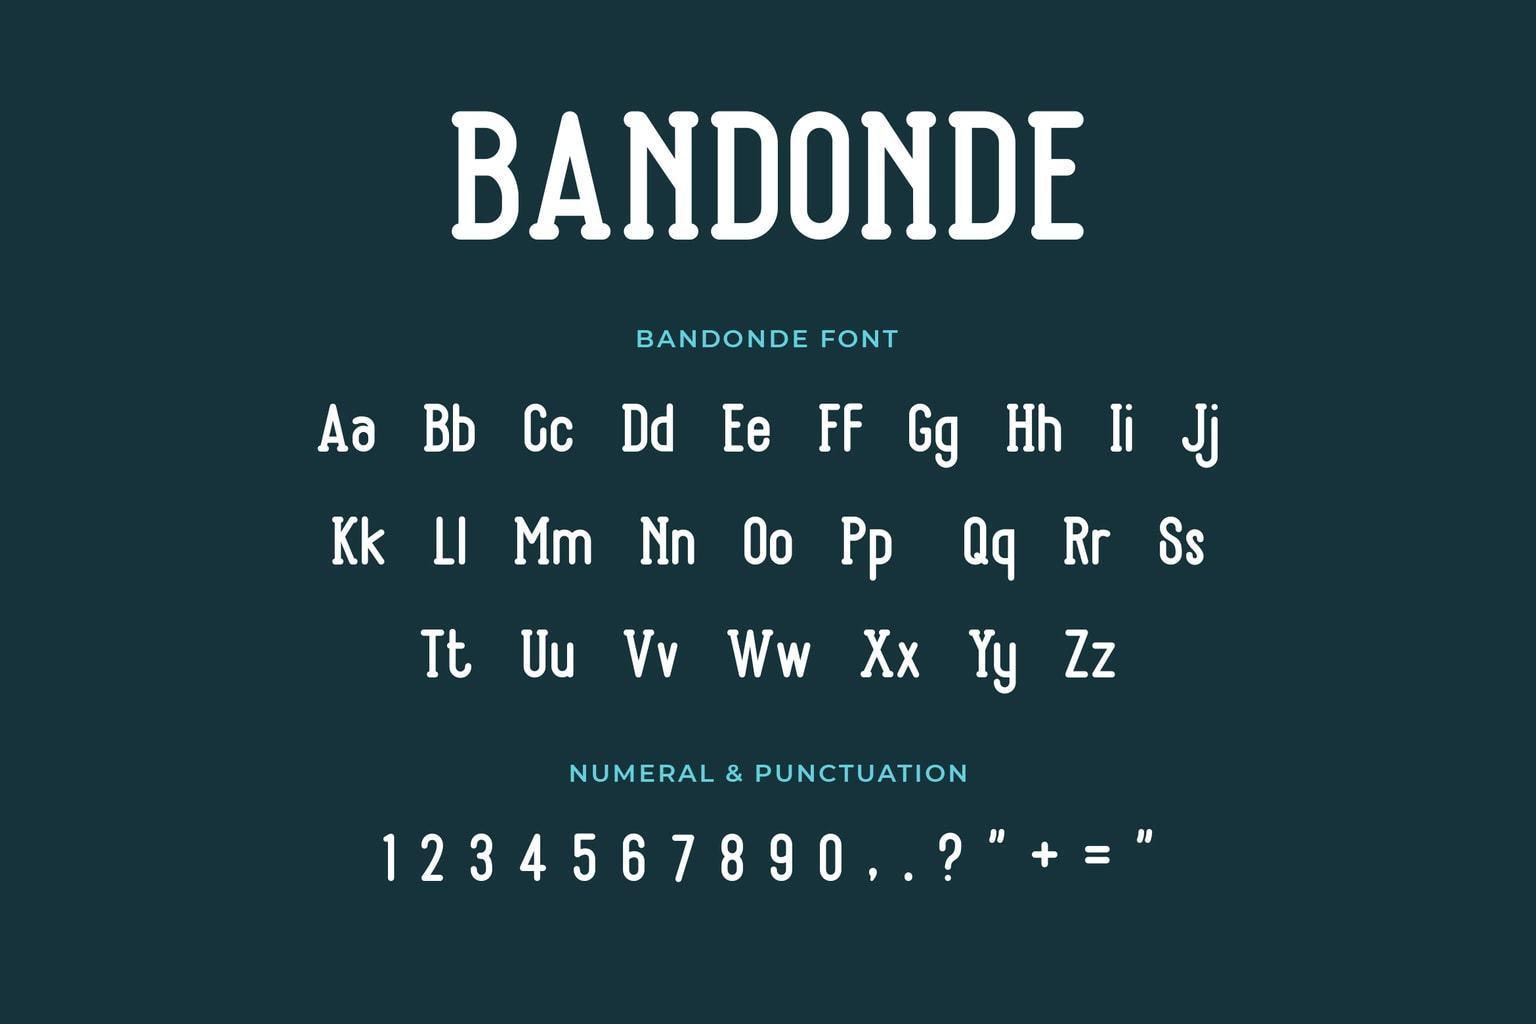 Bandonde-Versatile-Serif-Font-2